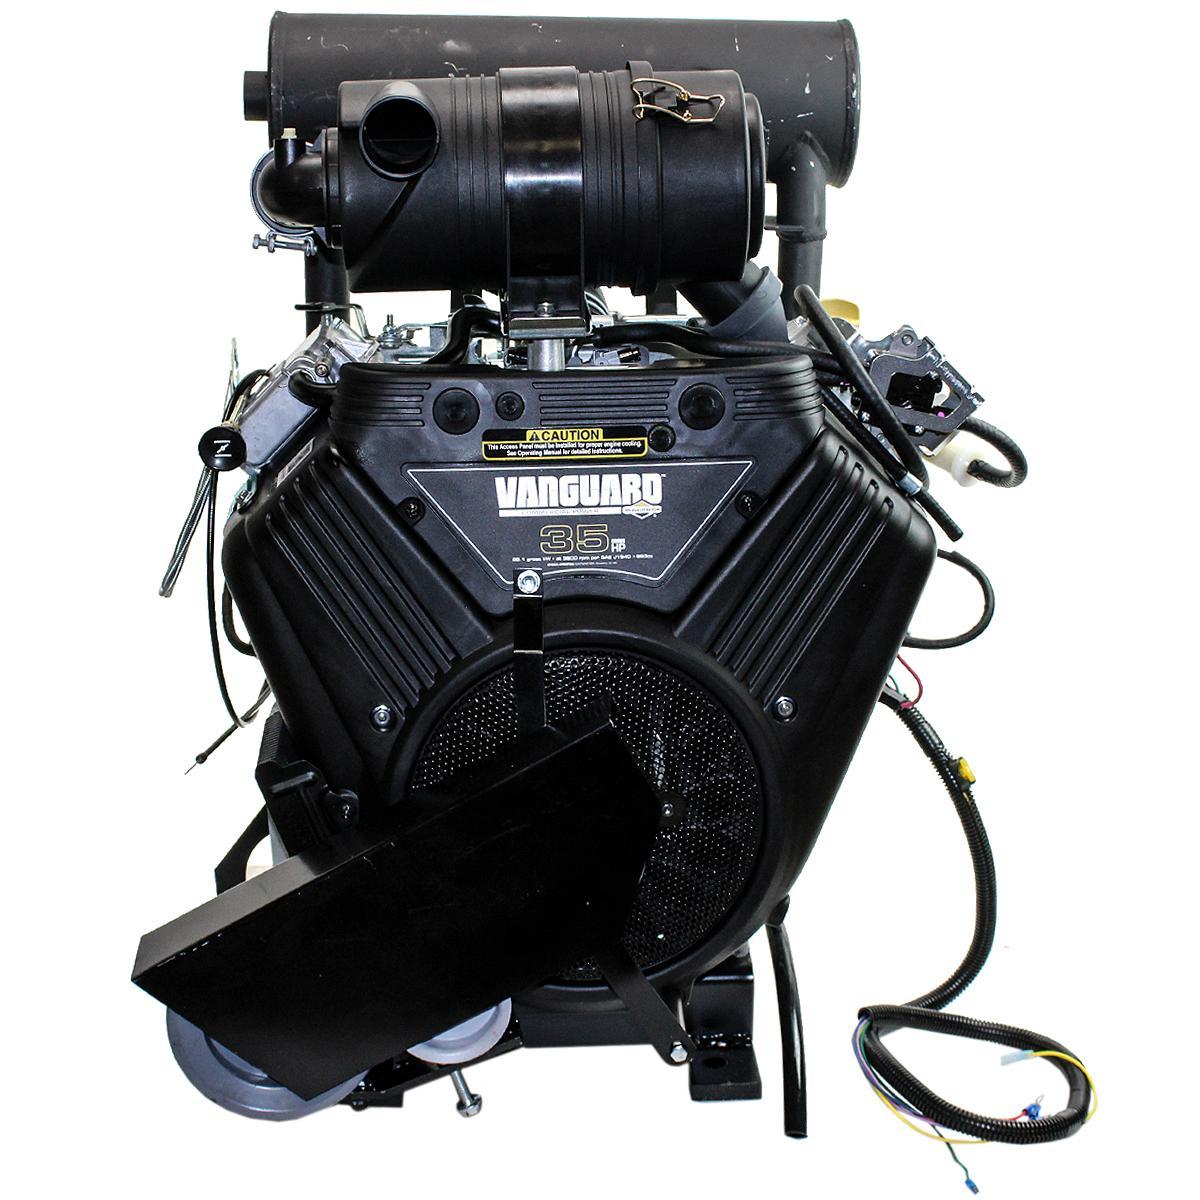 Incredible 613477 Bobcat 610 R5 Briggs Stratton 35Hp Horizontal Vanguard Wiring 101 Akebretraxxcnl